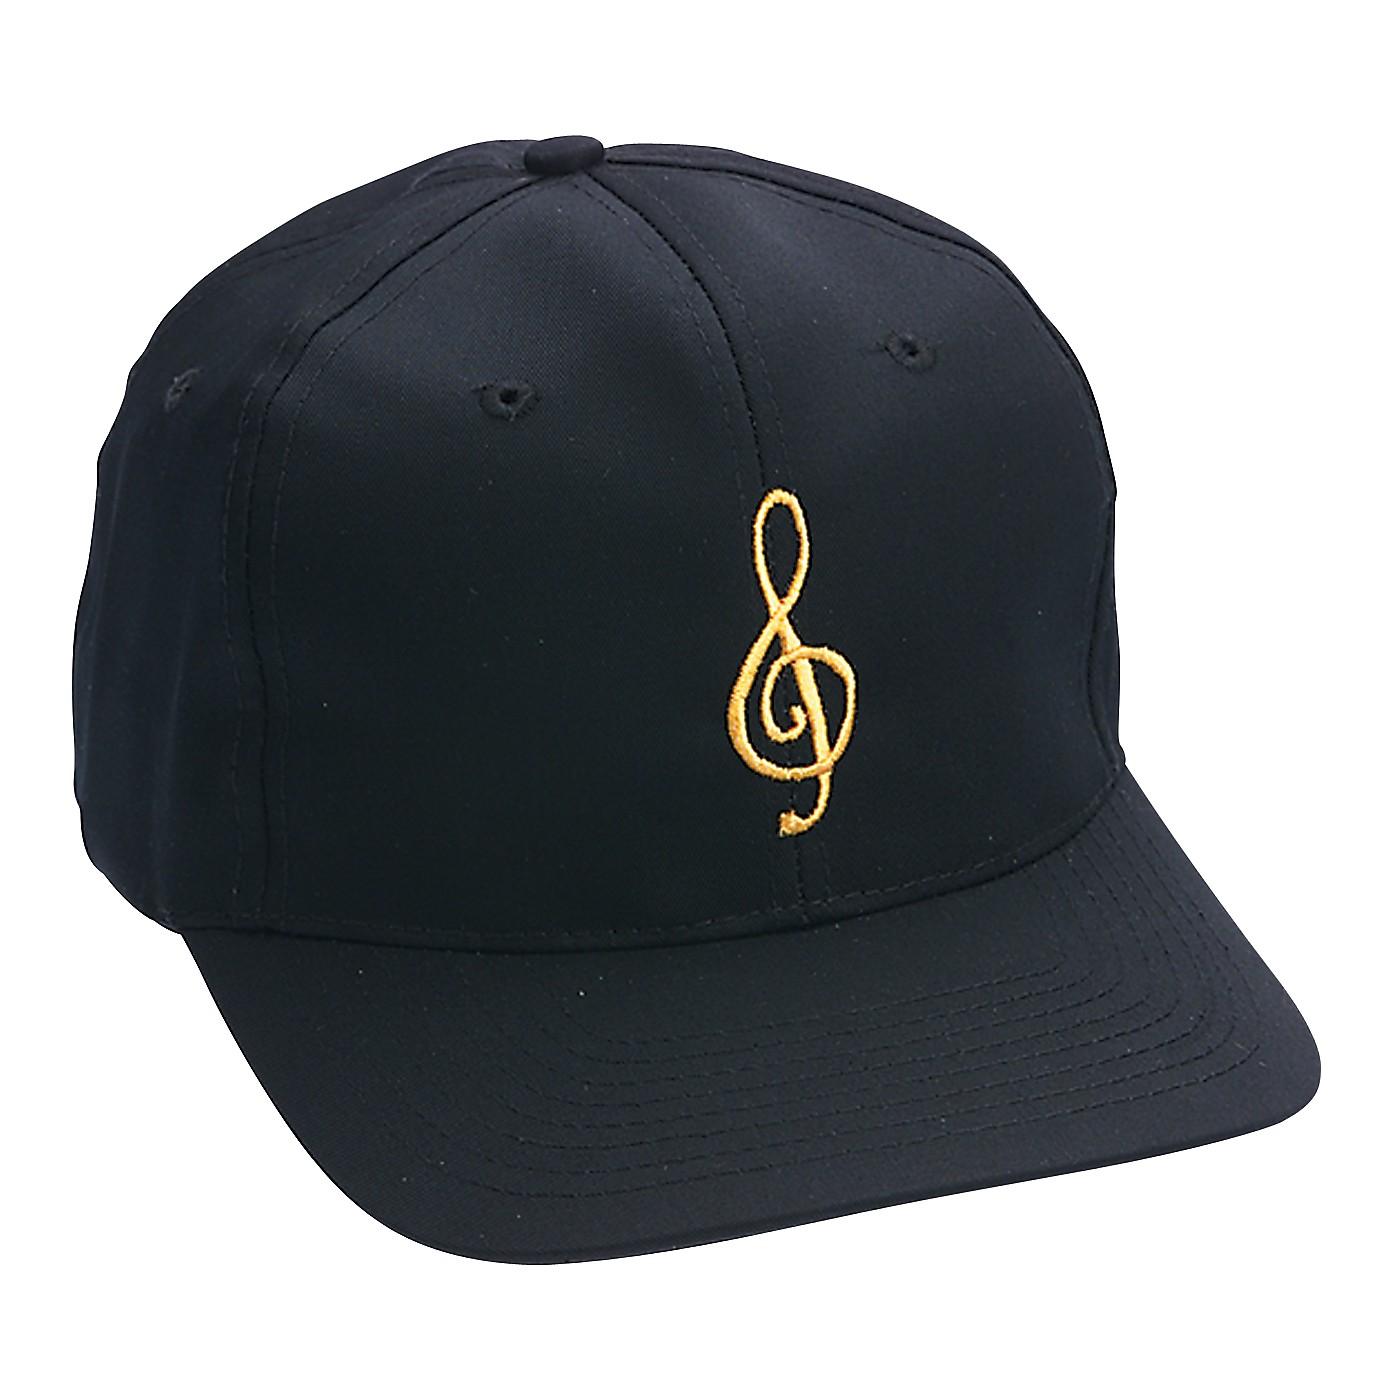 AIM Black/Gold Treble Clef Hat thumbnail